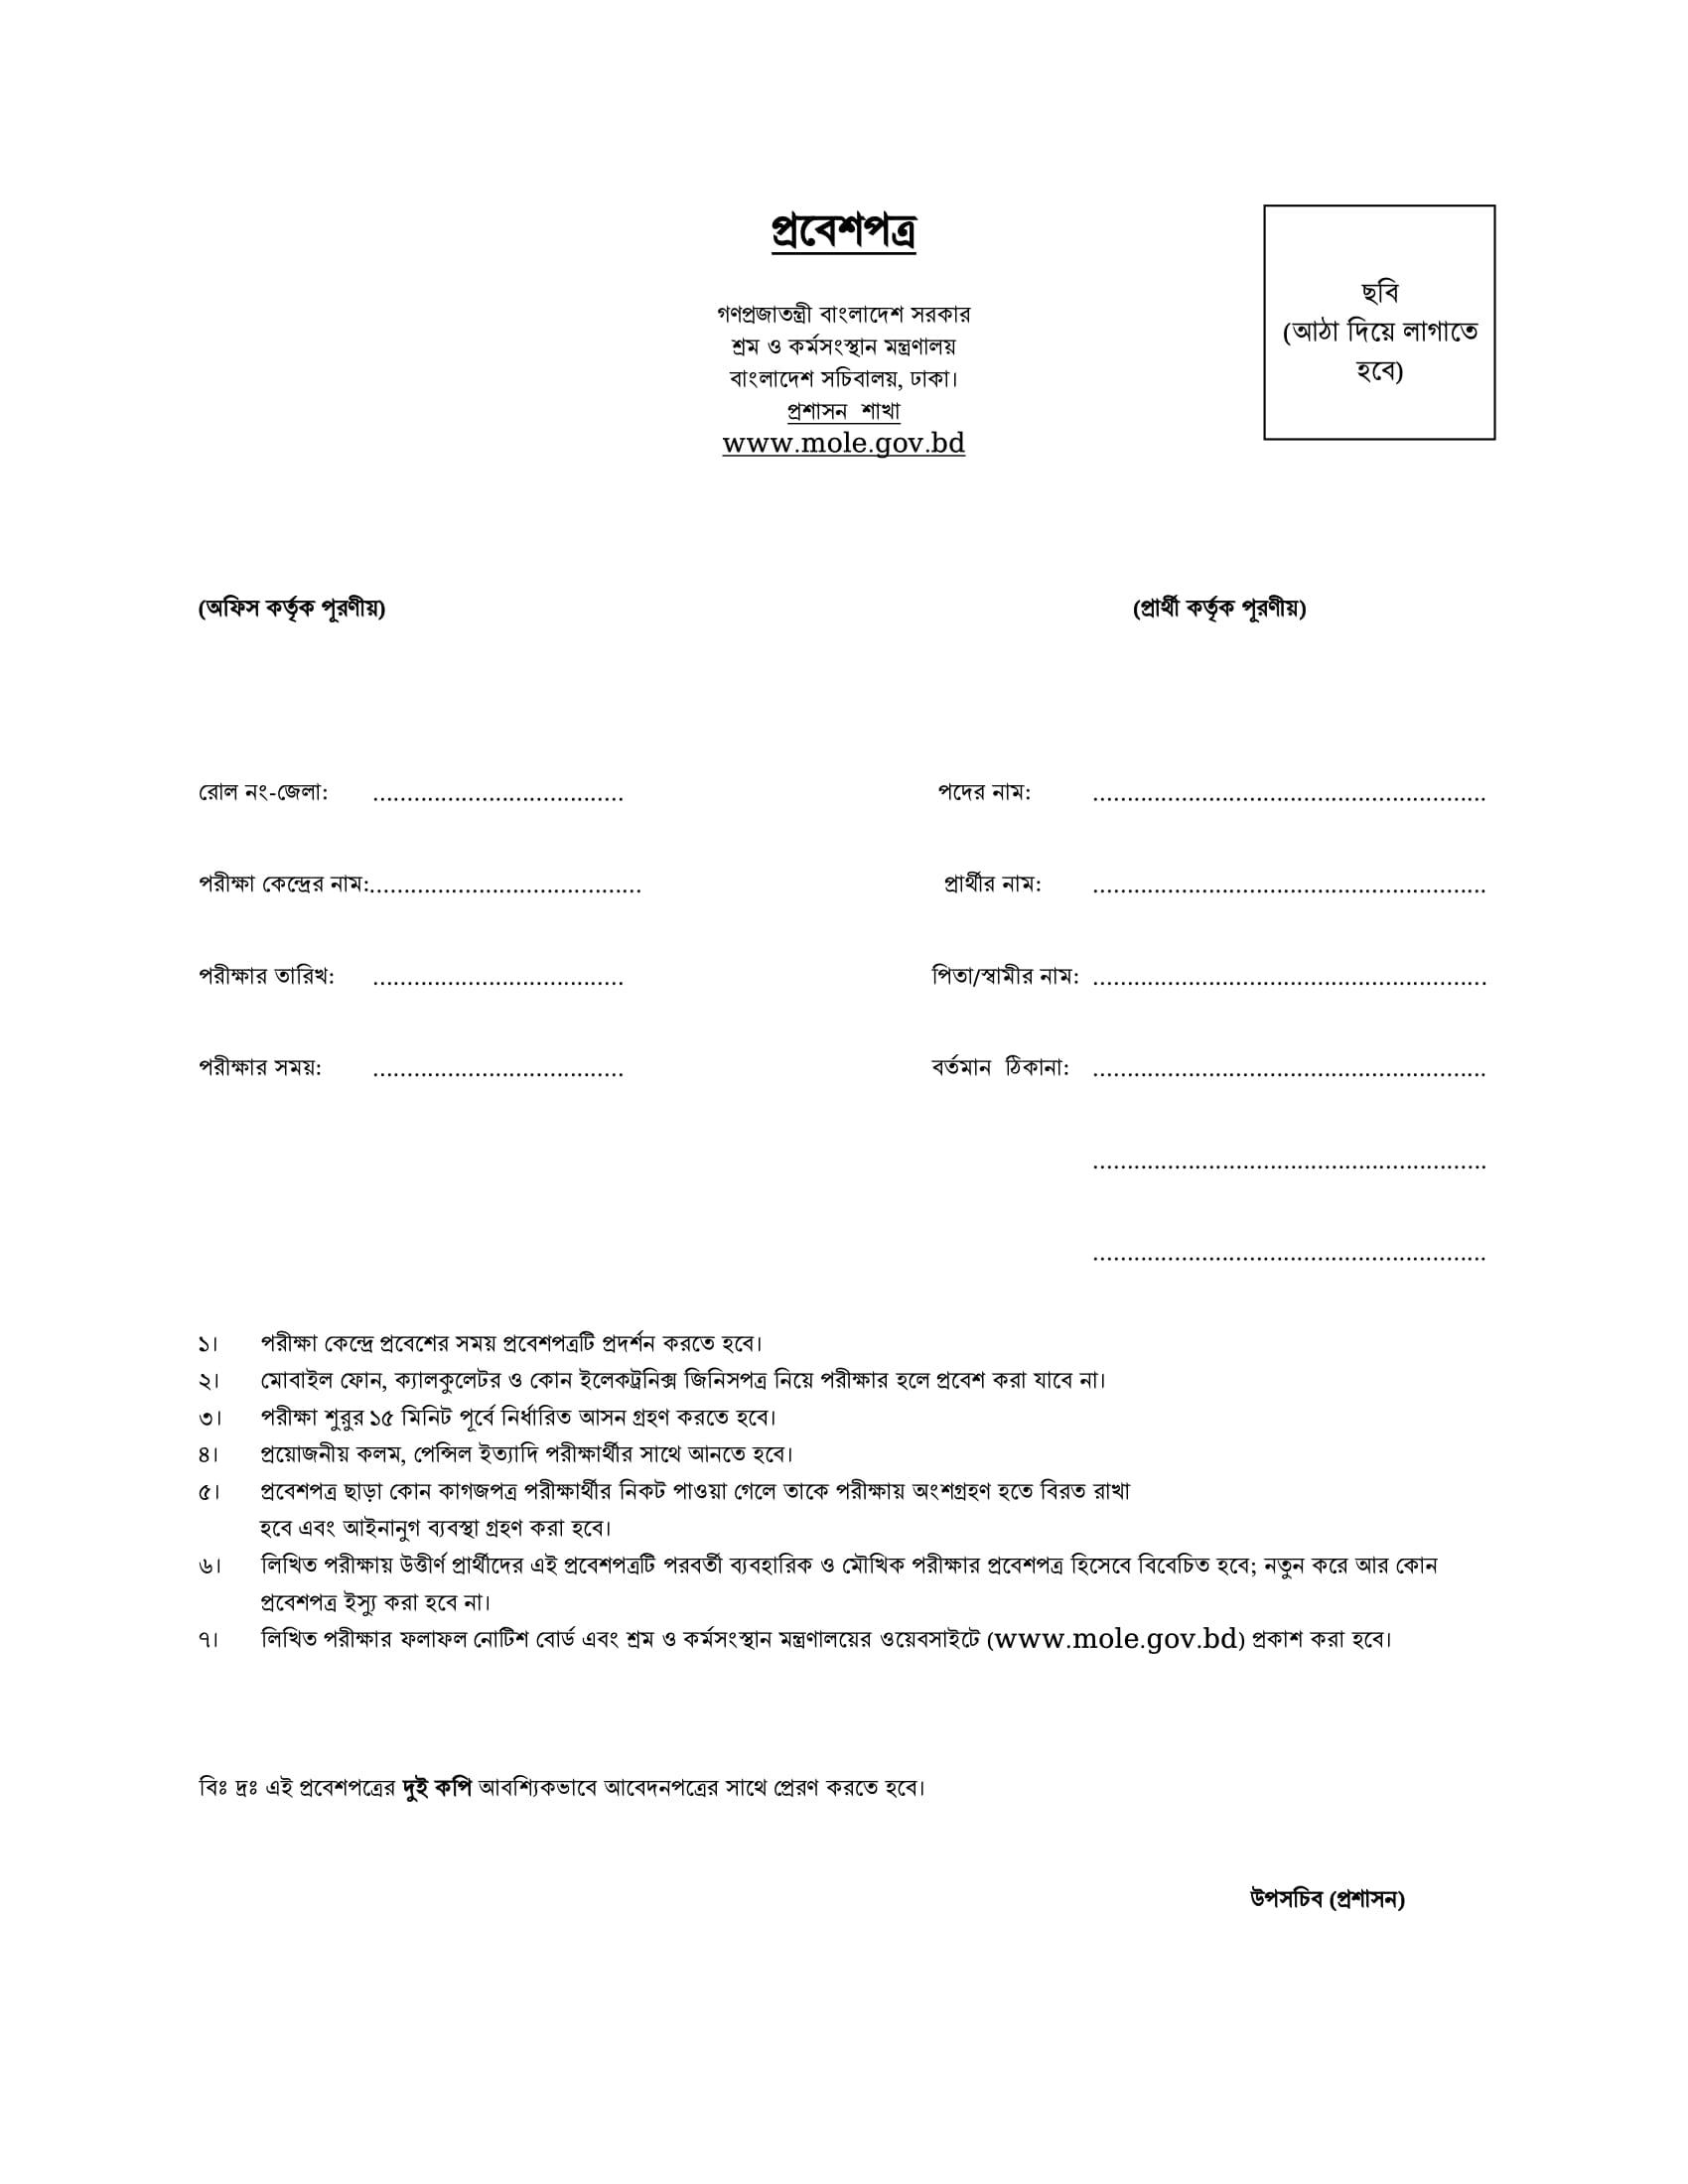 MOLE Job Admit Card